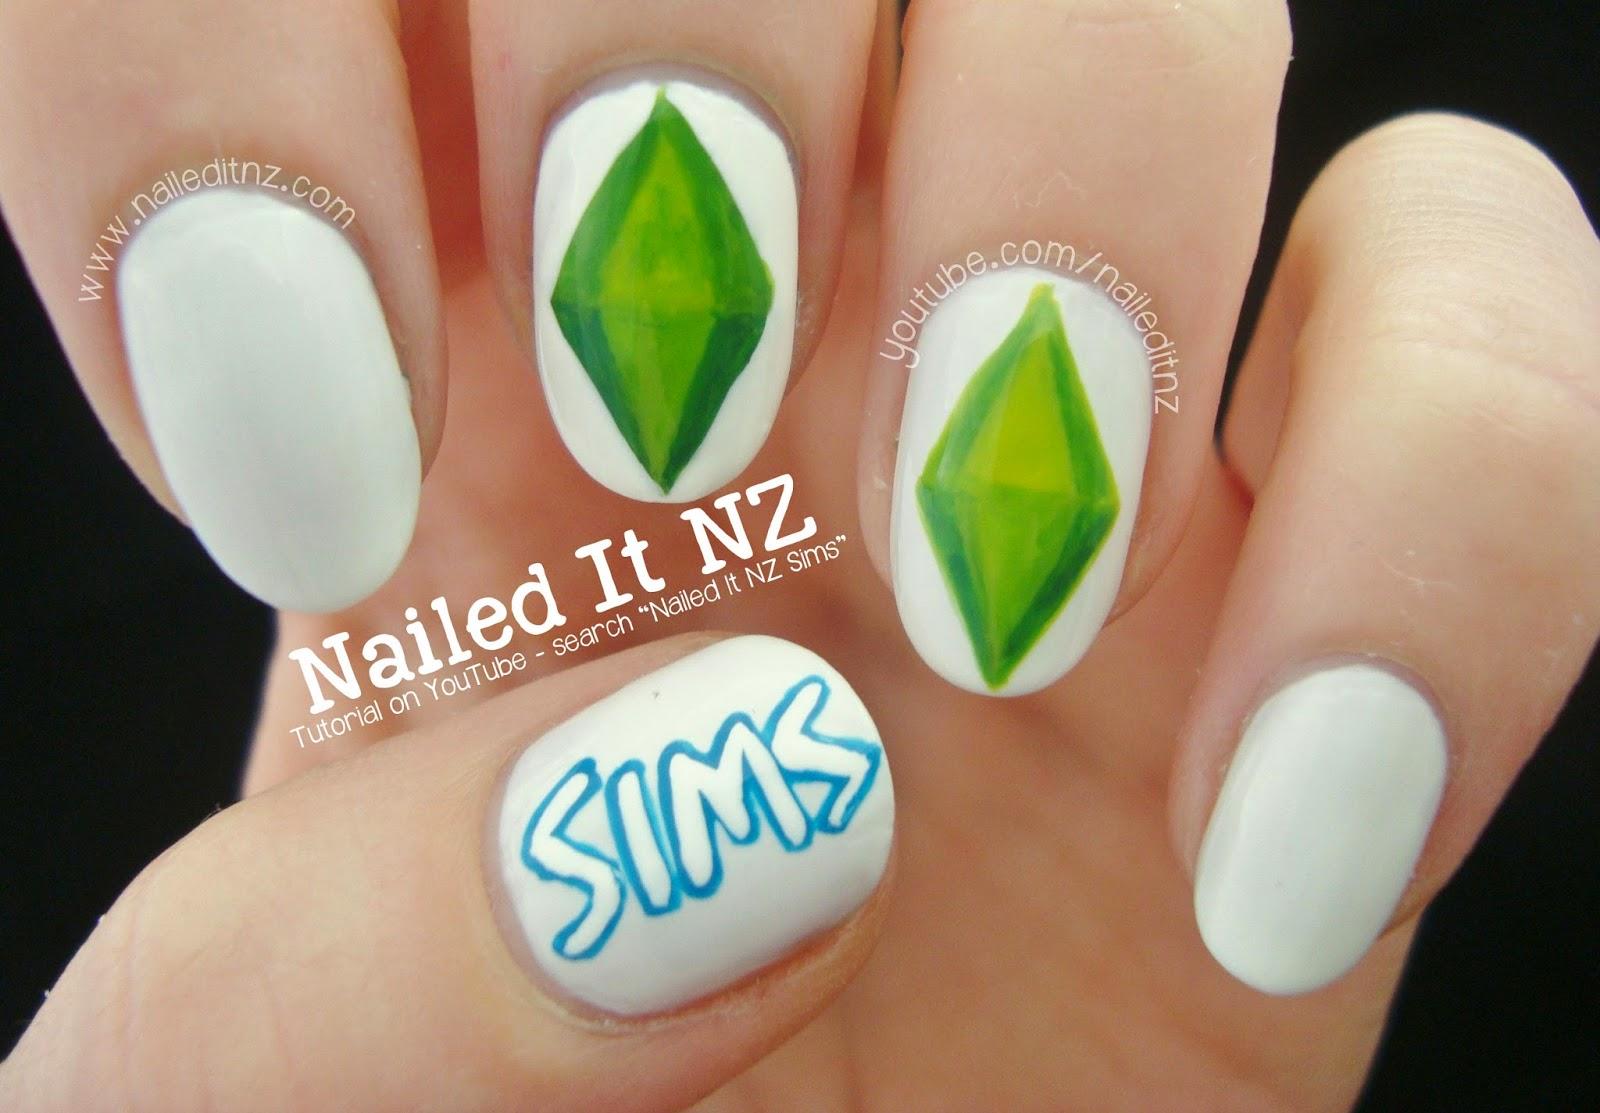 The Sims Nail Art Tutorial